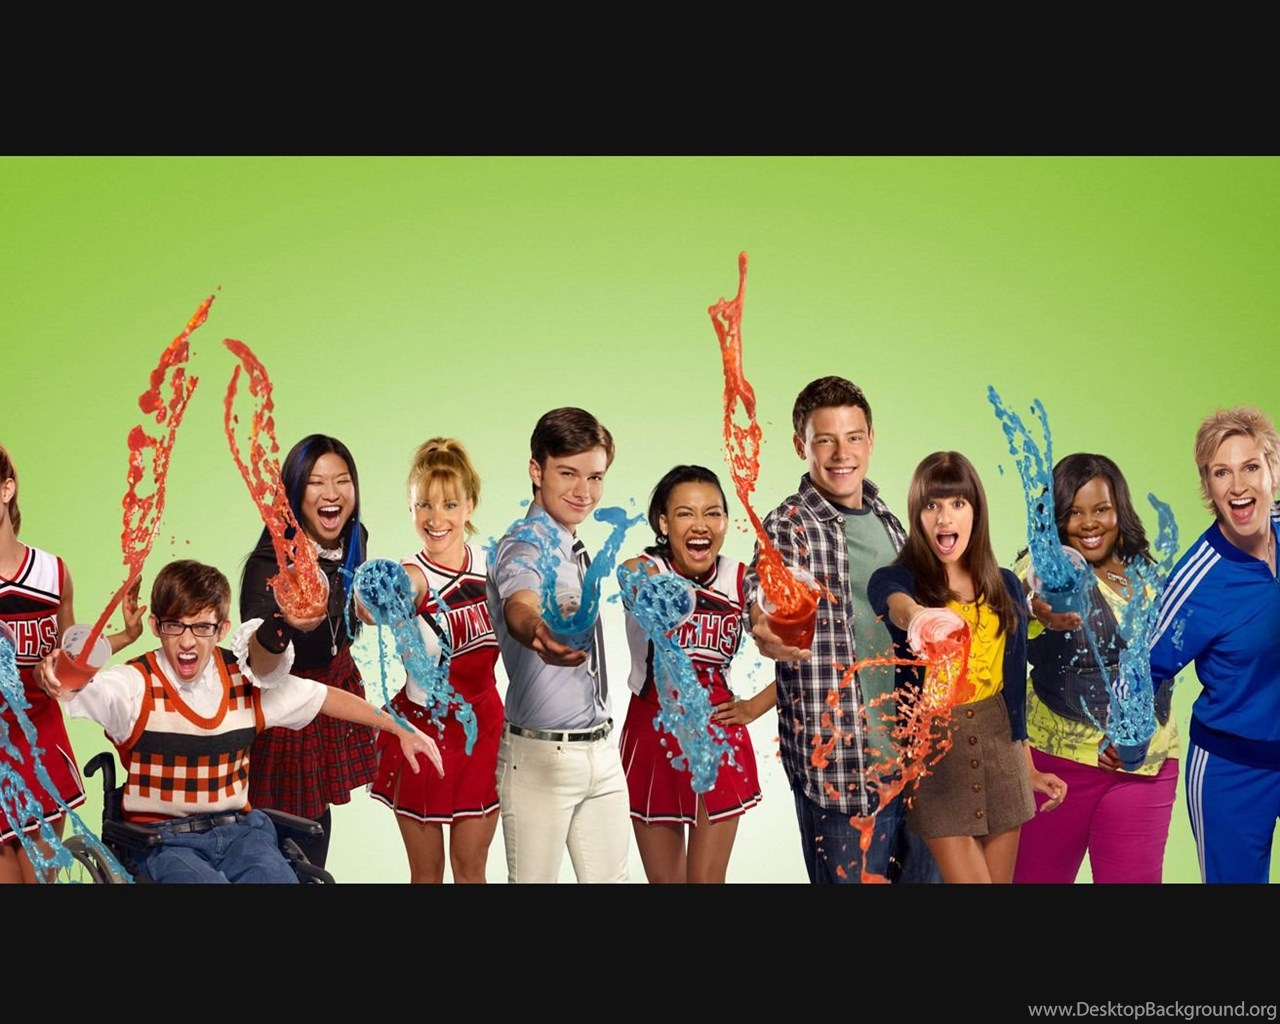 Glee Wallpapers 2 By Seb88 On Deviantart Desktop Background